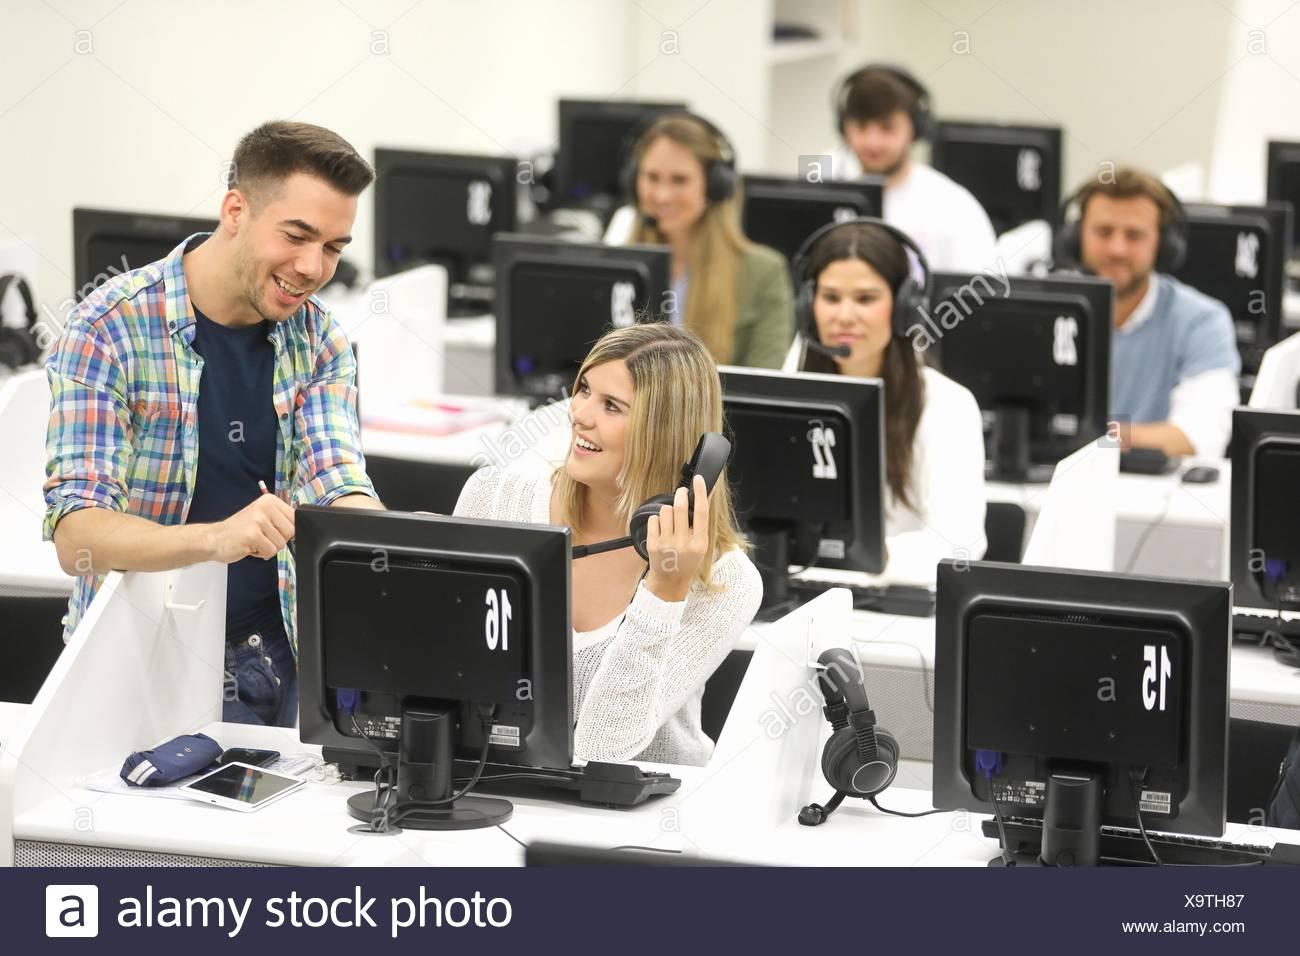 Studenten im Sprachlabor, Sprache, Schulungsraum, Universität des Baskenlandes, Donostia, San Sebastian, Gipuzkoa, Spanien Stockbild